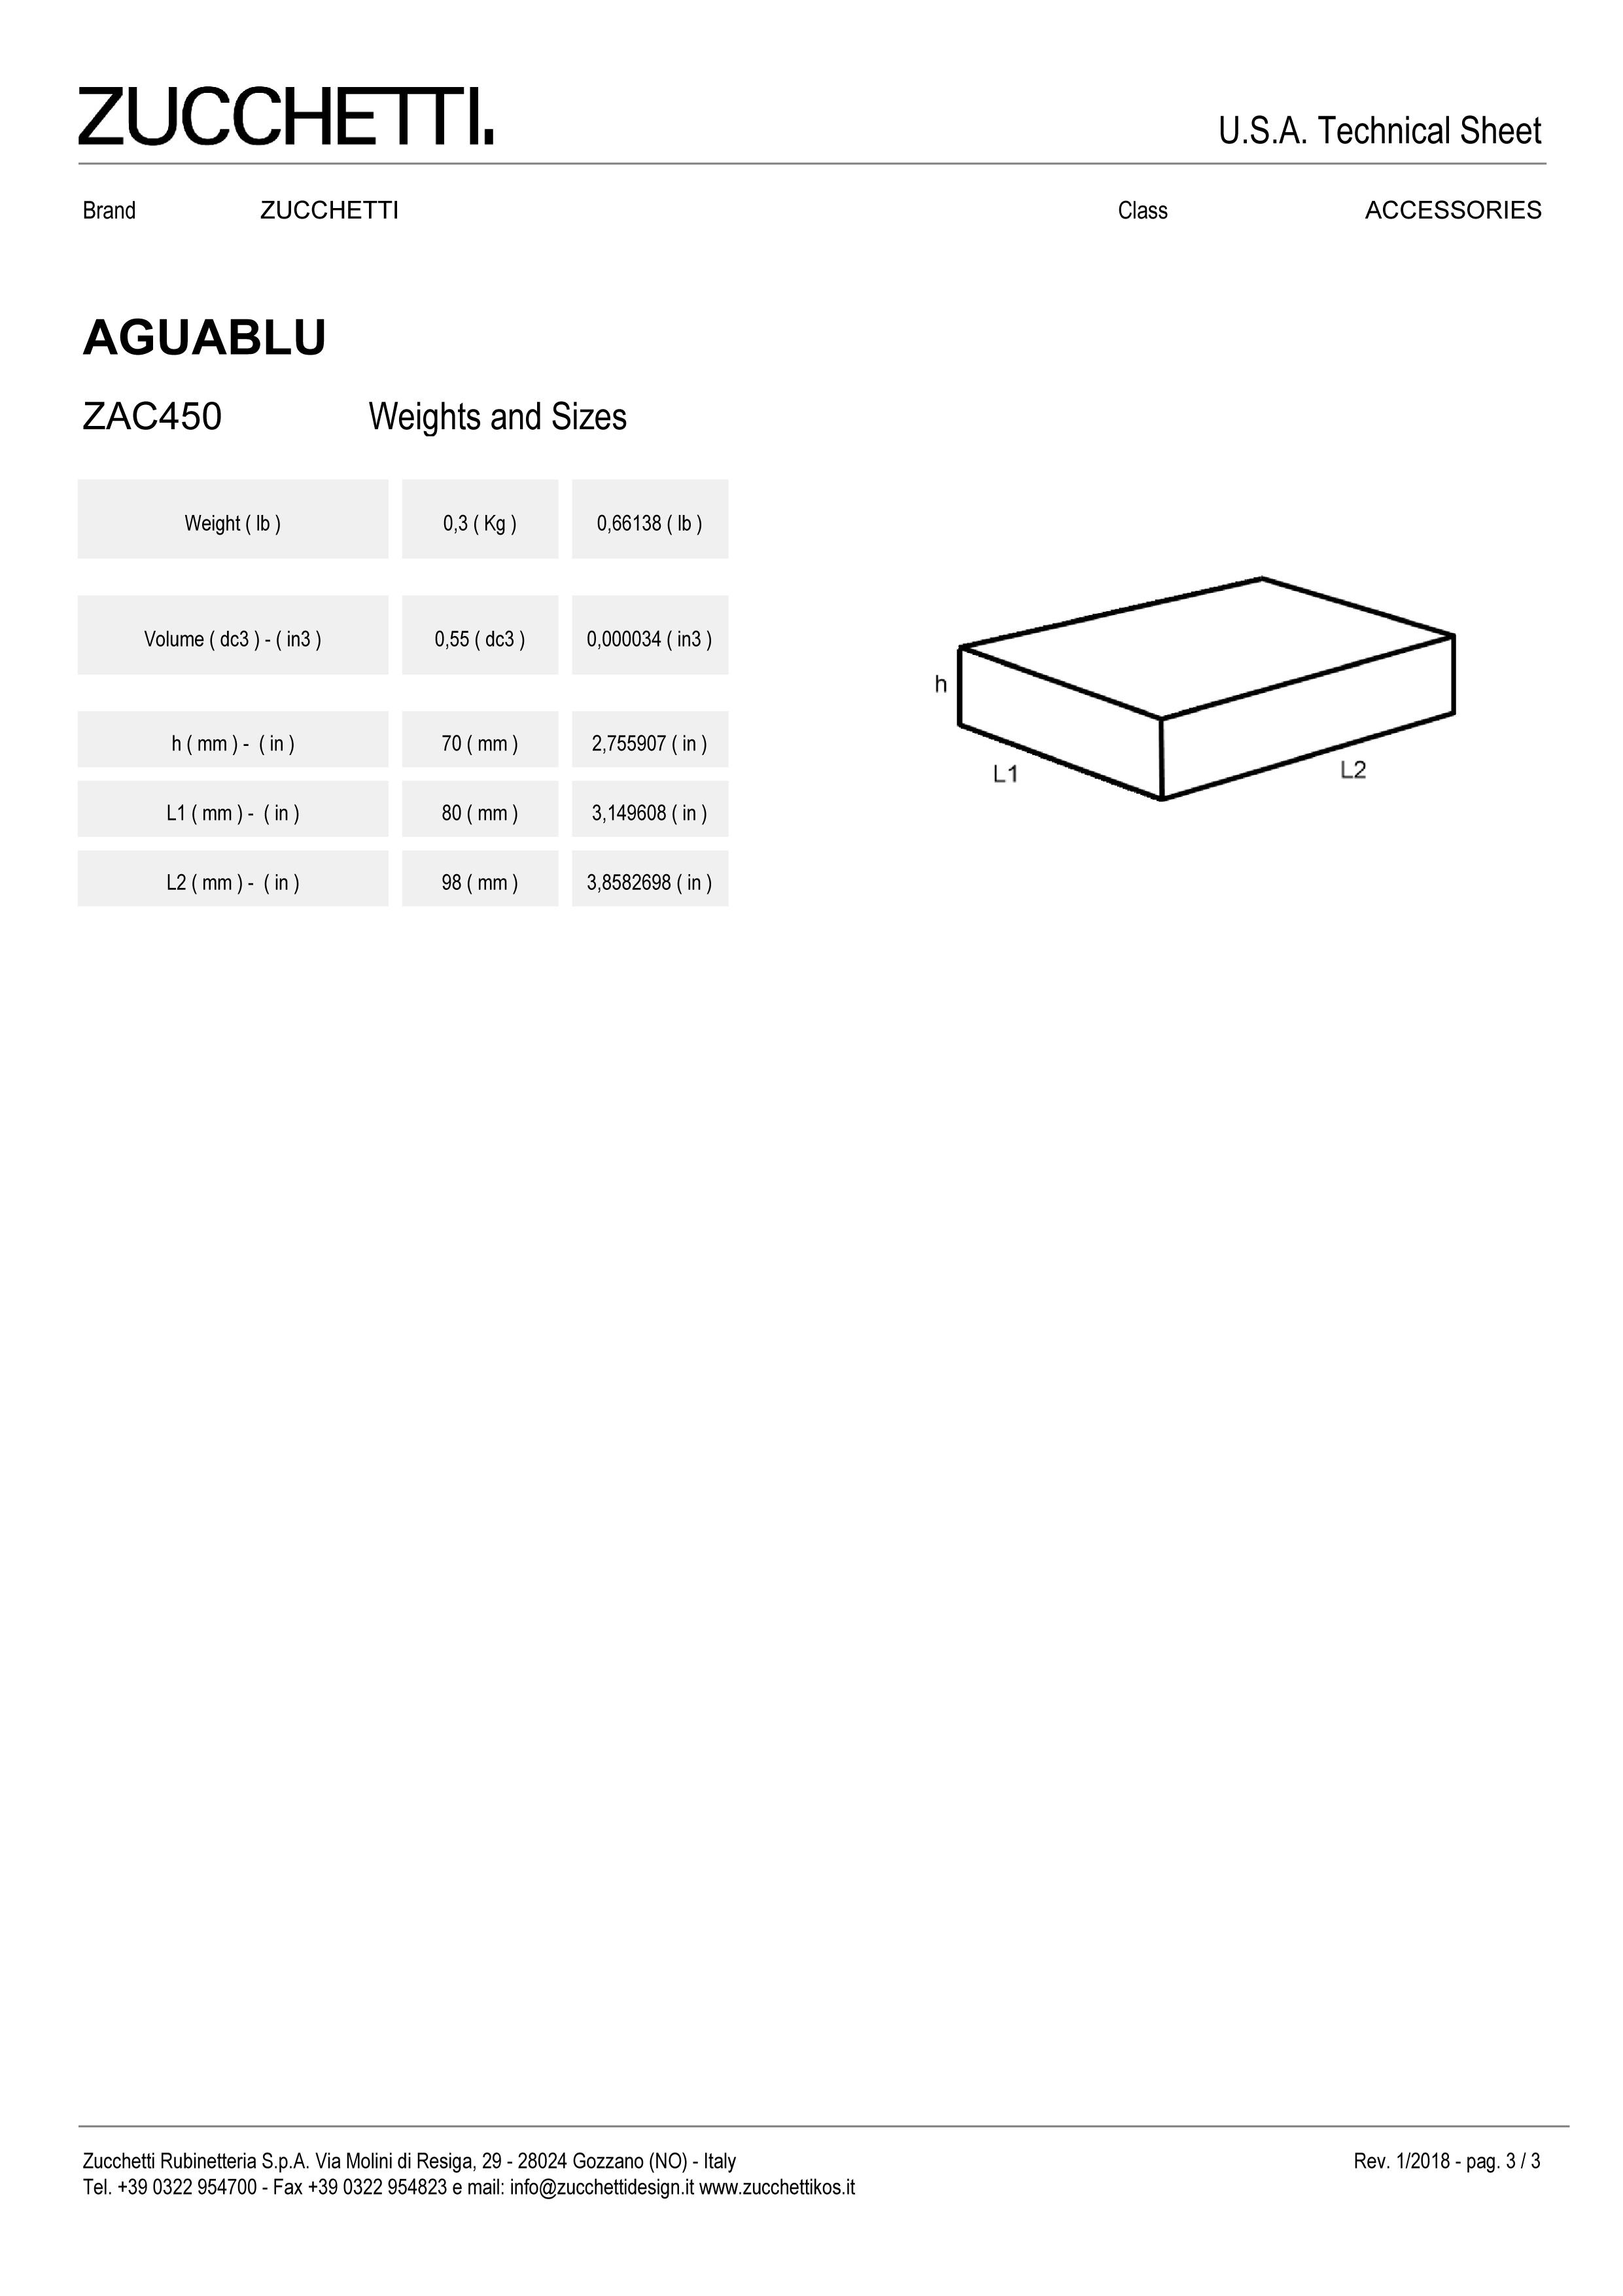 Zuchetti Aquablu robe hook, 3,9 w x 3,9 h, PC-3.jpg